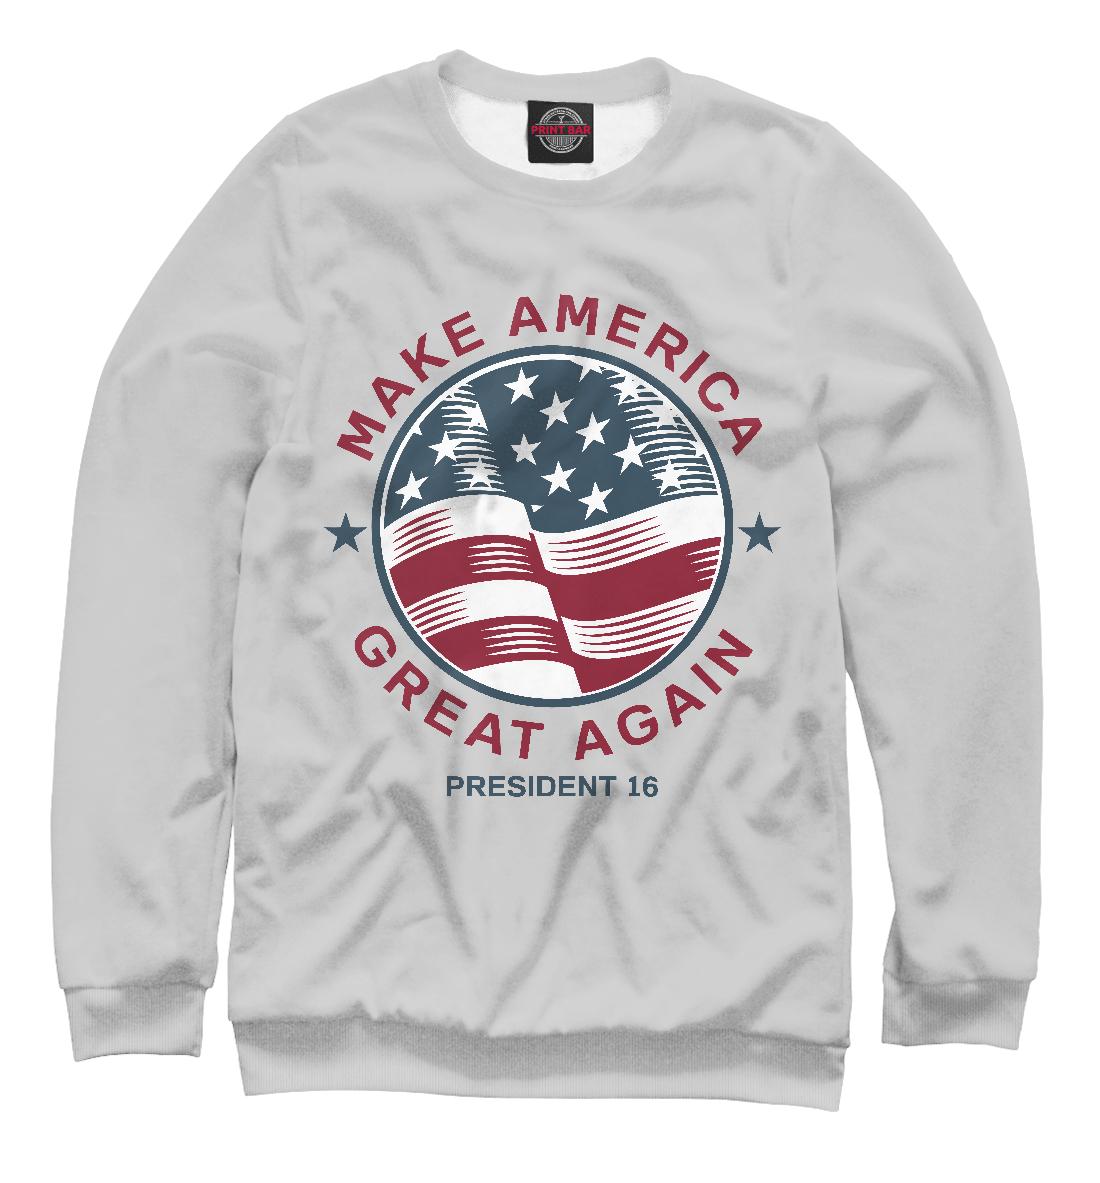 Купить Make America Great Again, Printbar, Свитшоты, CTS-164412-swi-1